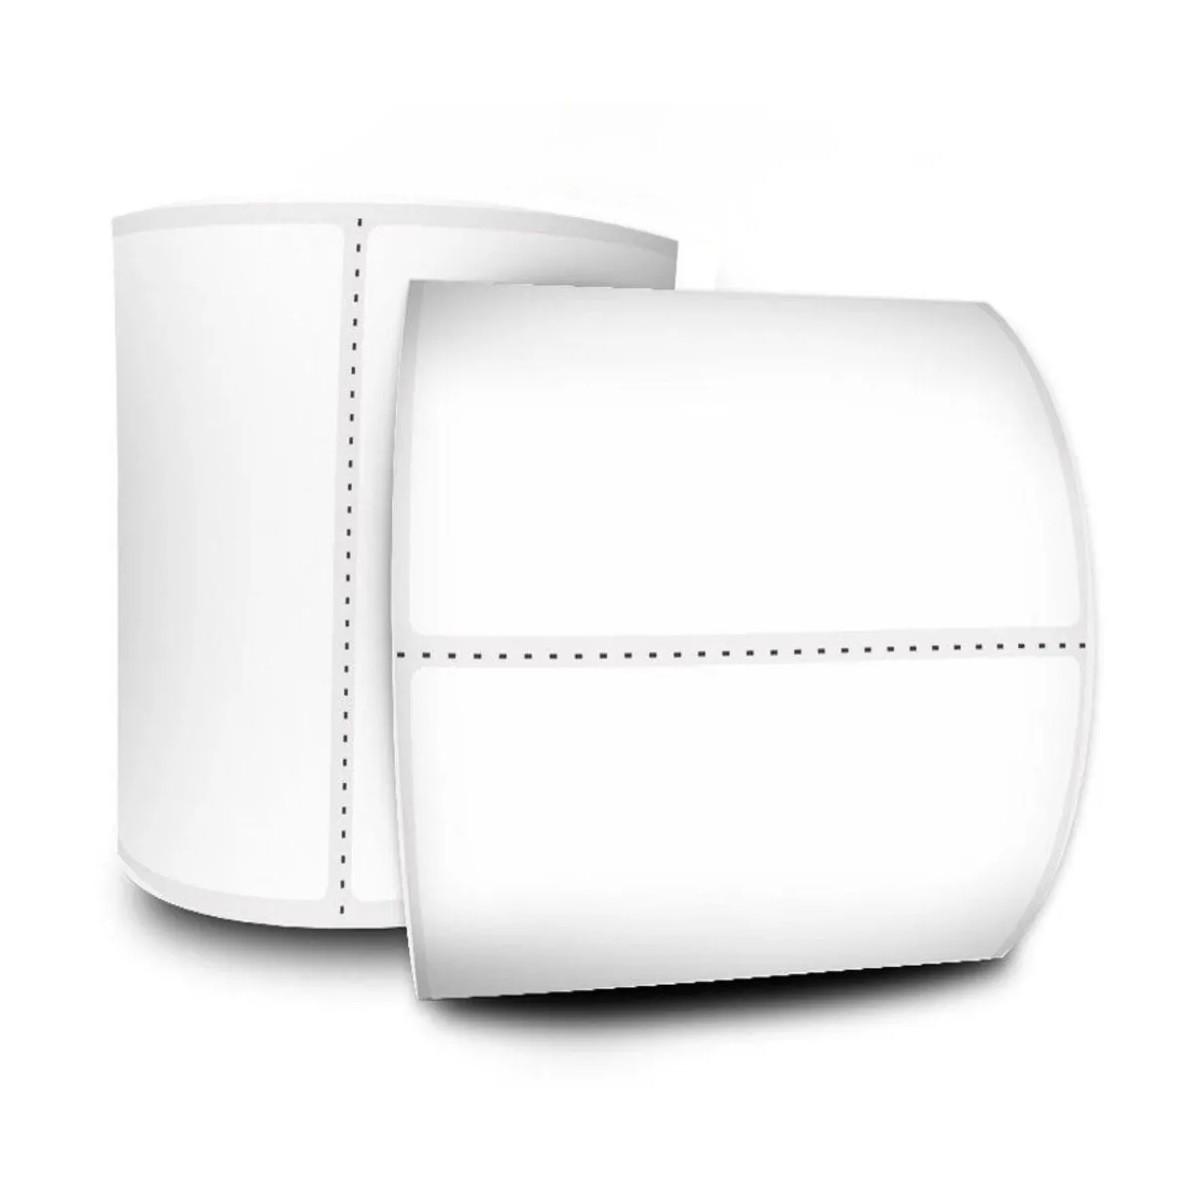 Kit 2x Etiqueta Branca Térmica com Adesivo Acrílico 100x150 250 etiquetas - P5181